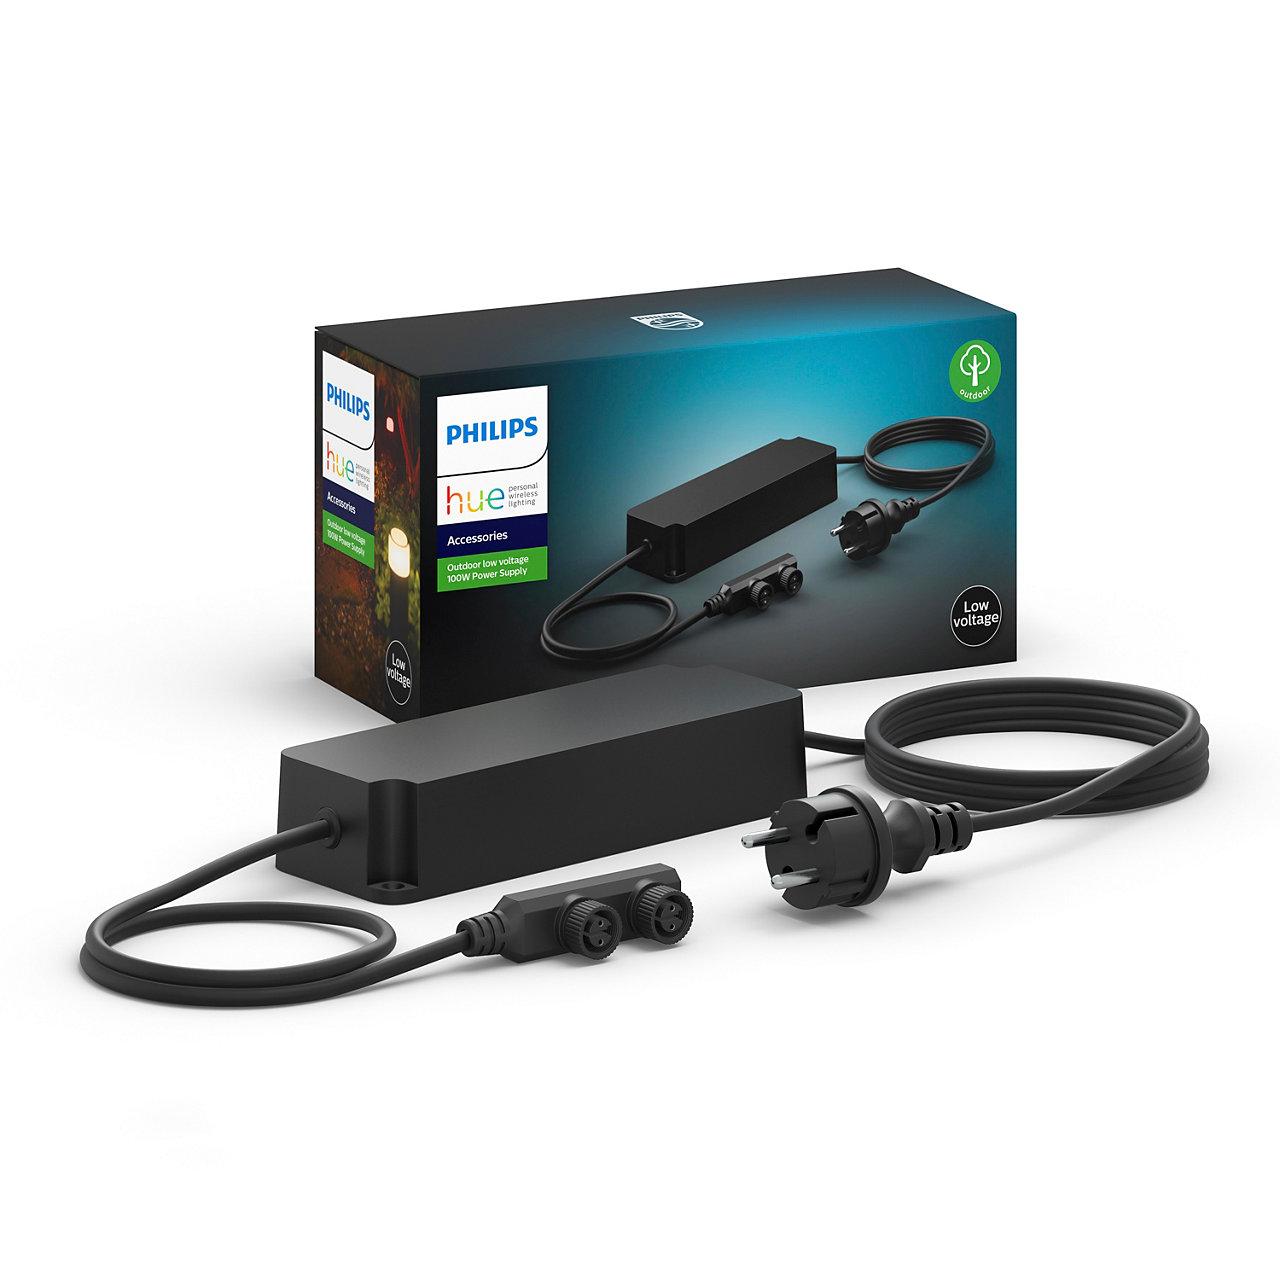 Philips Hue - Outdoor 100 Watt Powersupply